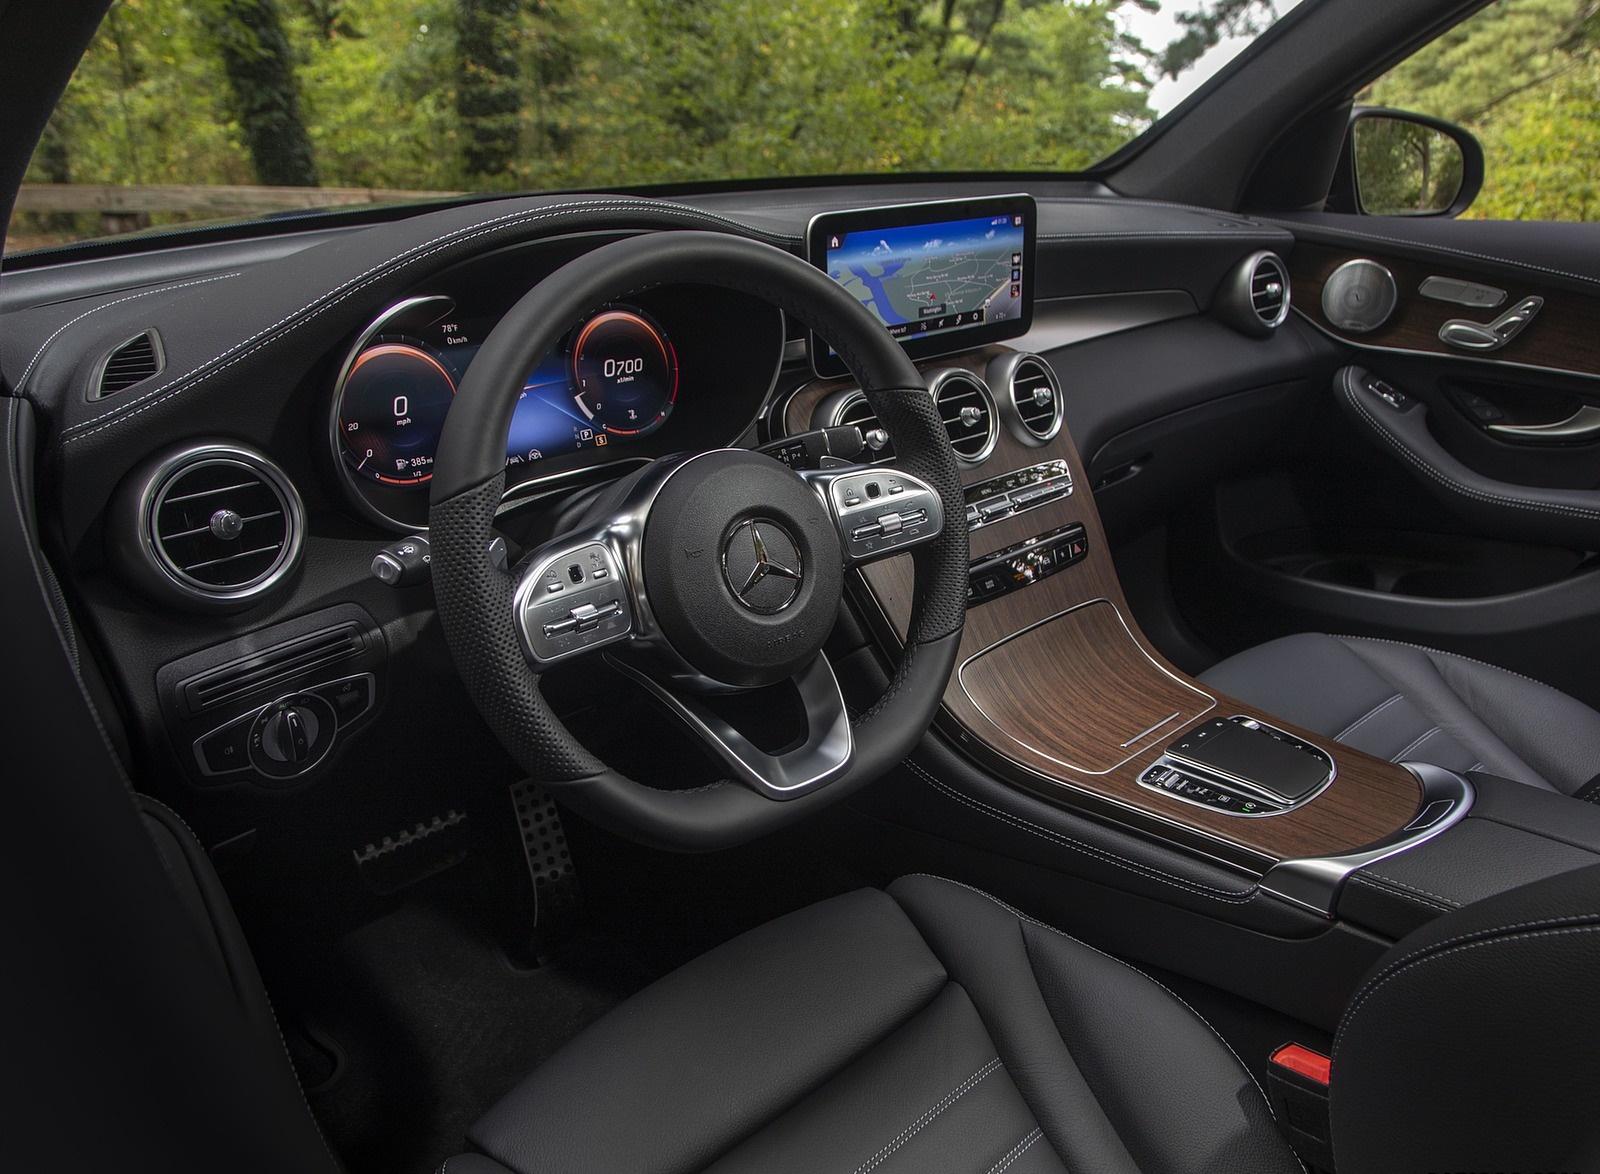 2020 Mercedes-Benz GLC 300 (US-Spec) Interior Wallpapers #20 of 62